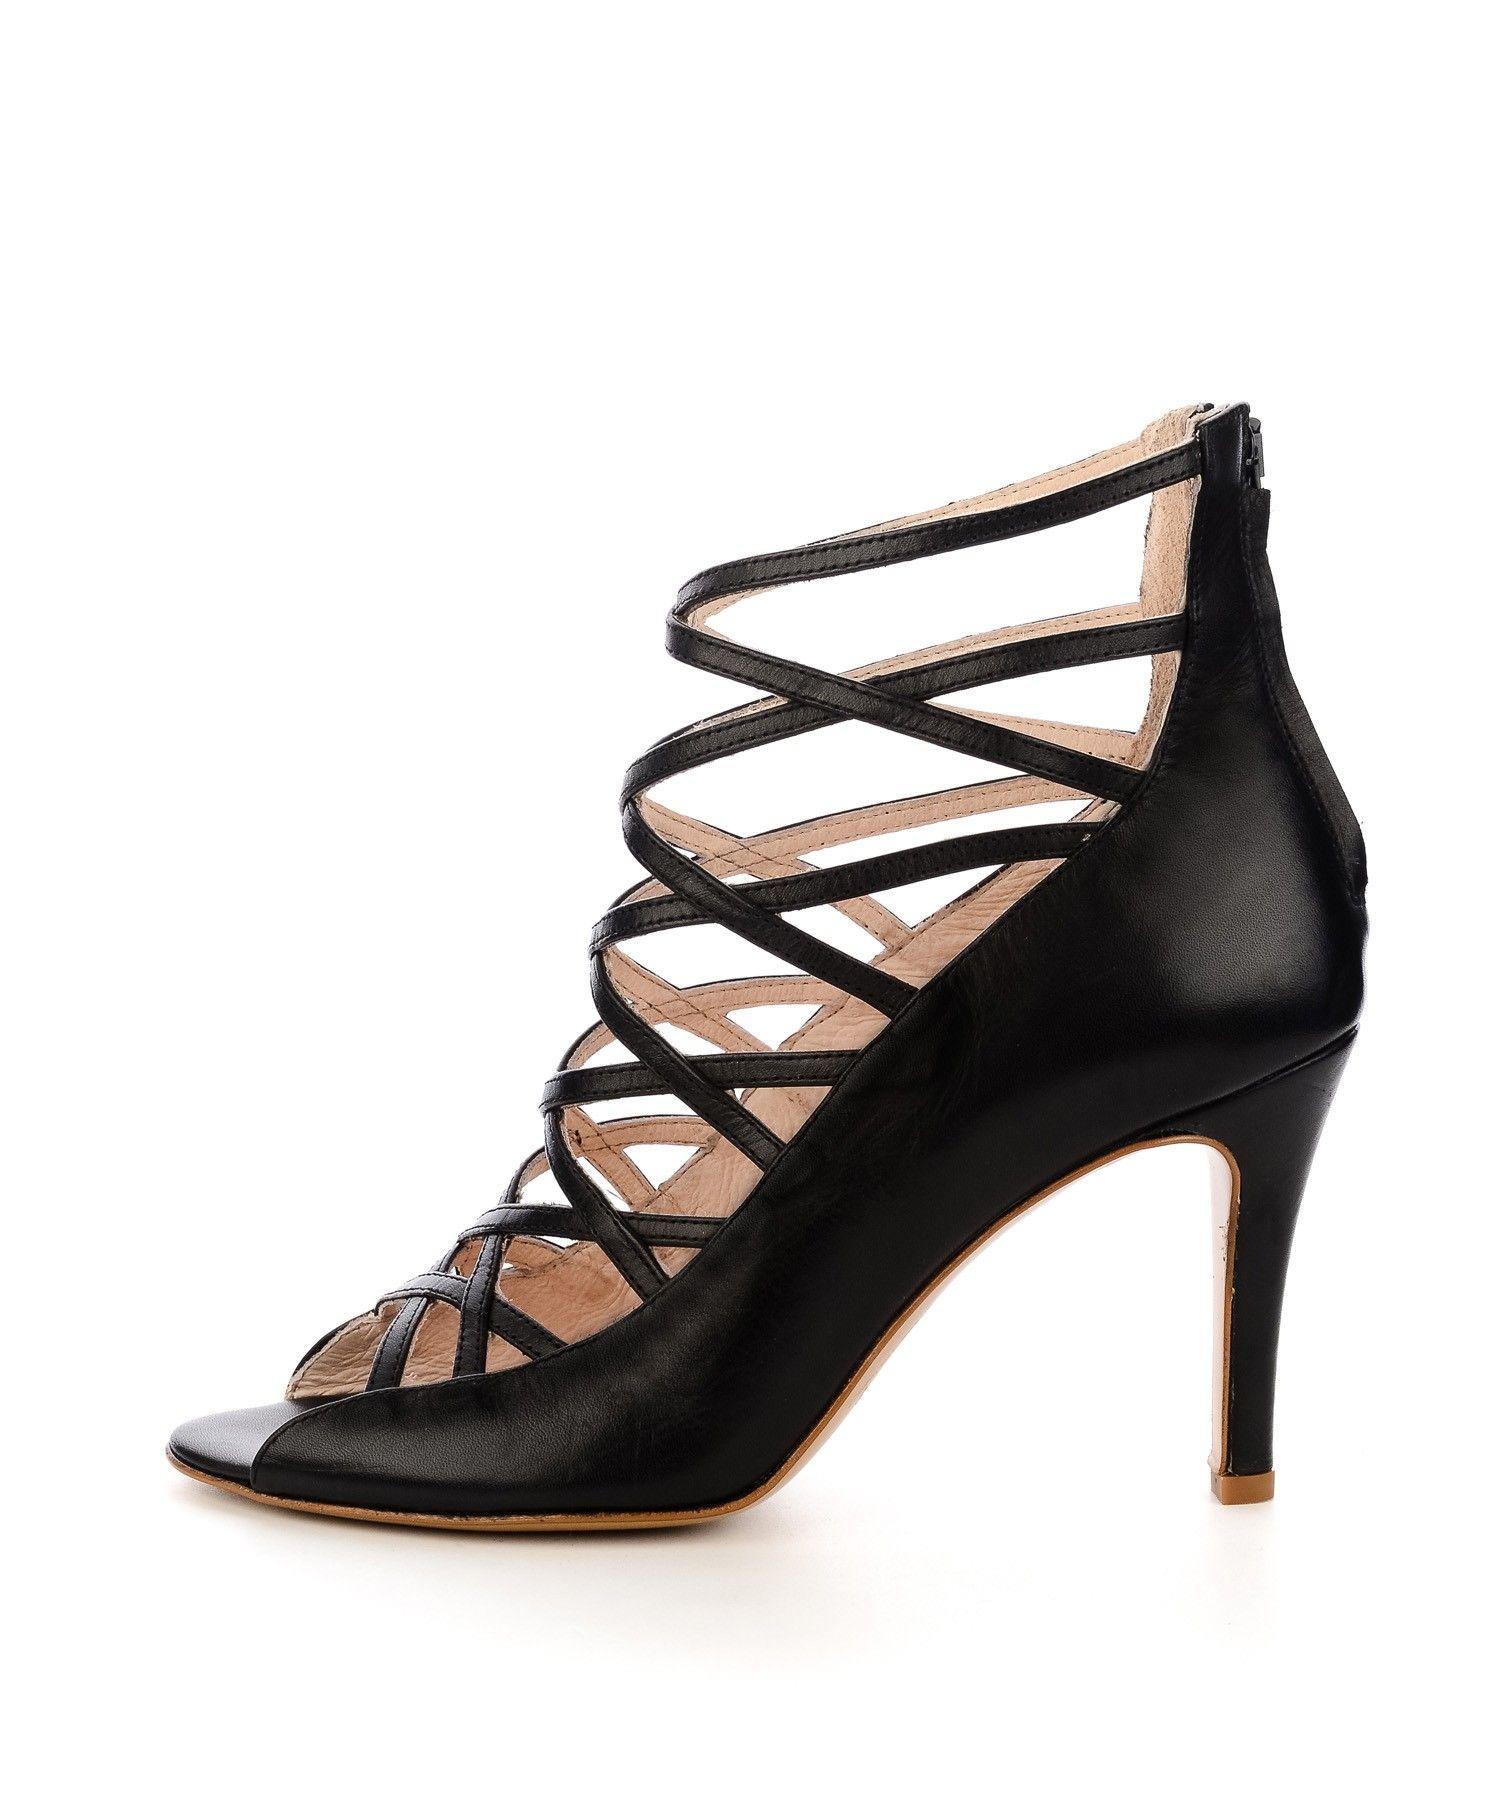 Czarne Letnie Botki Ze Skory Licowej Kolekcja Damska Heels Shoes High Heels